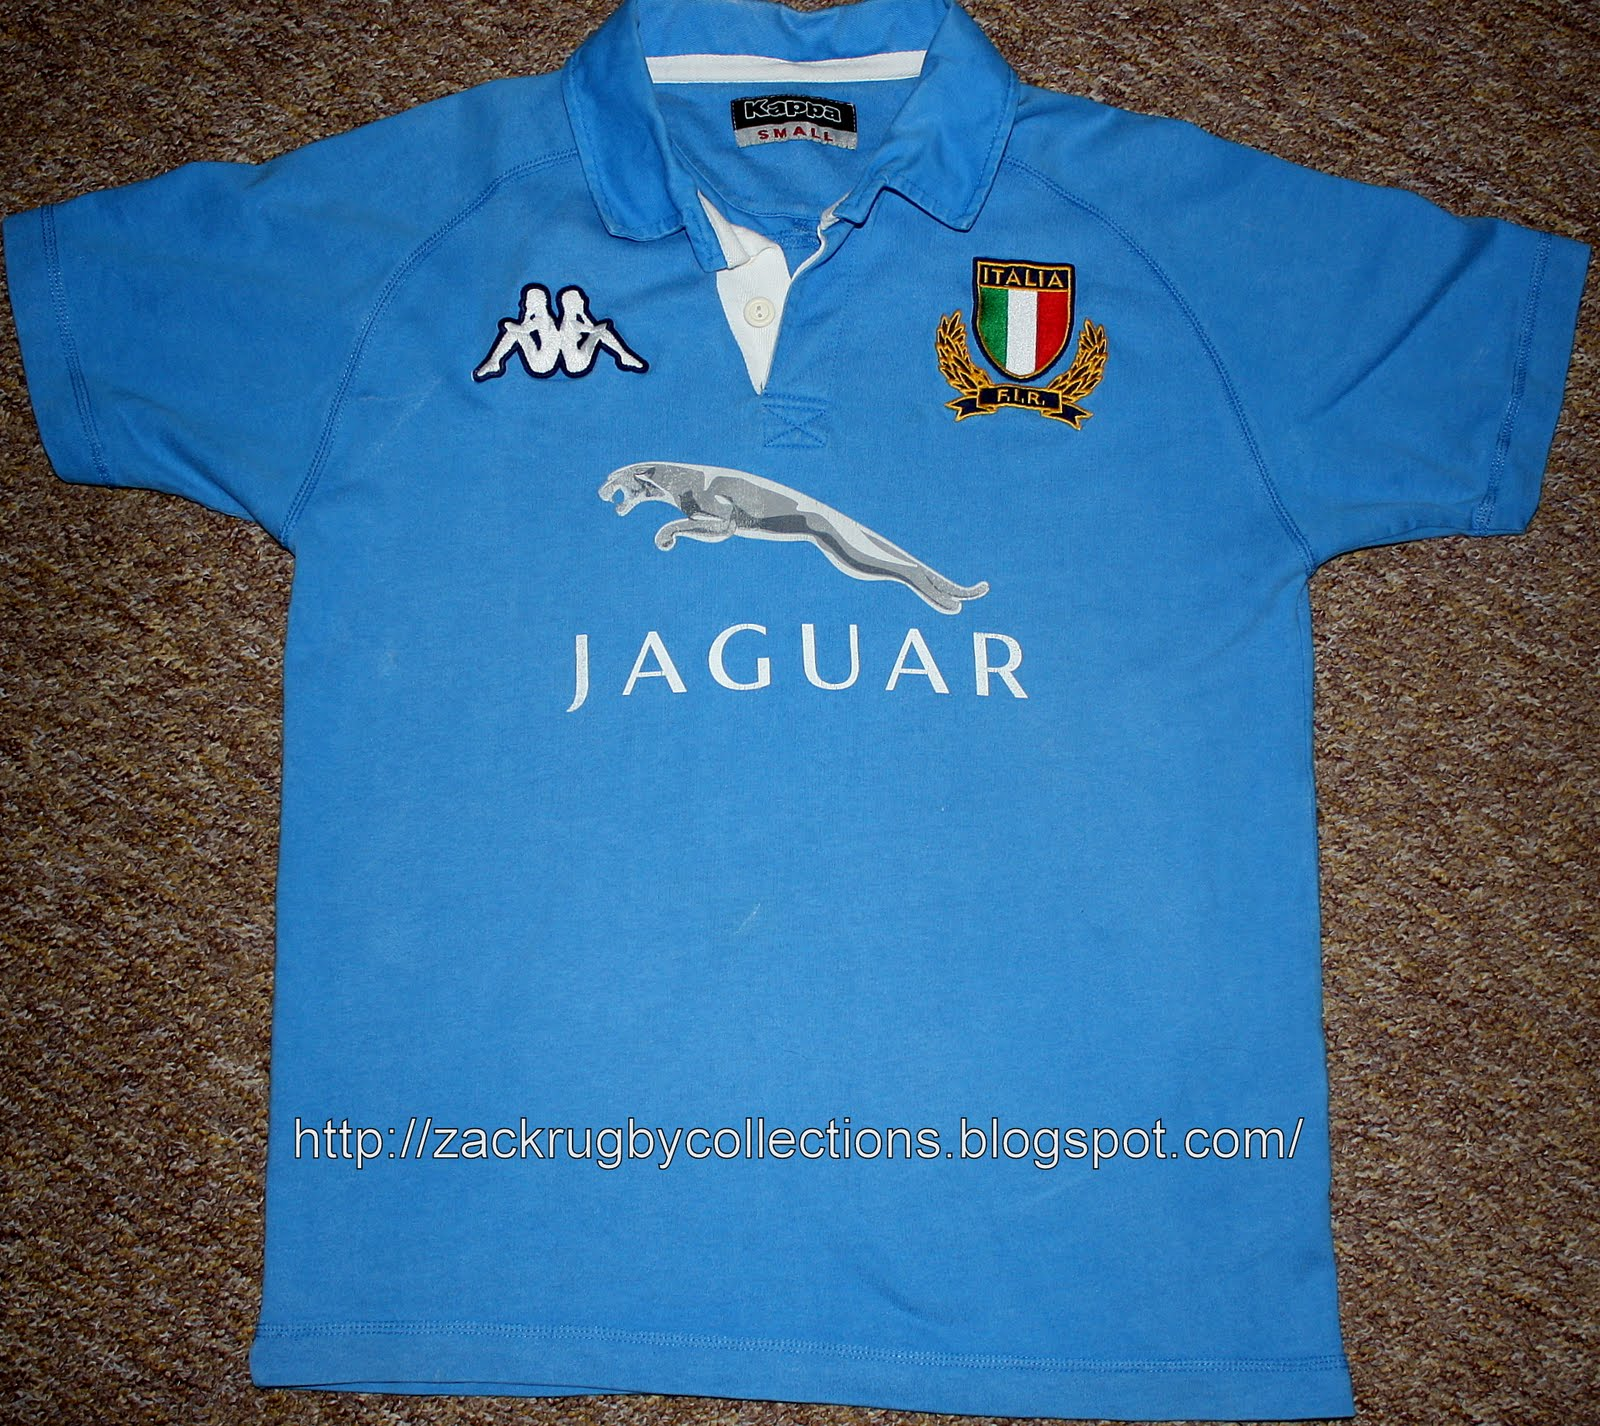 jaguar t nyc market shirts casa products bowery white backstage